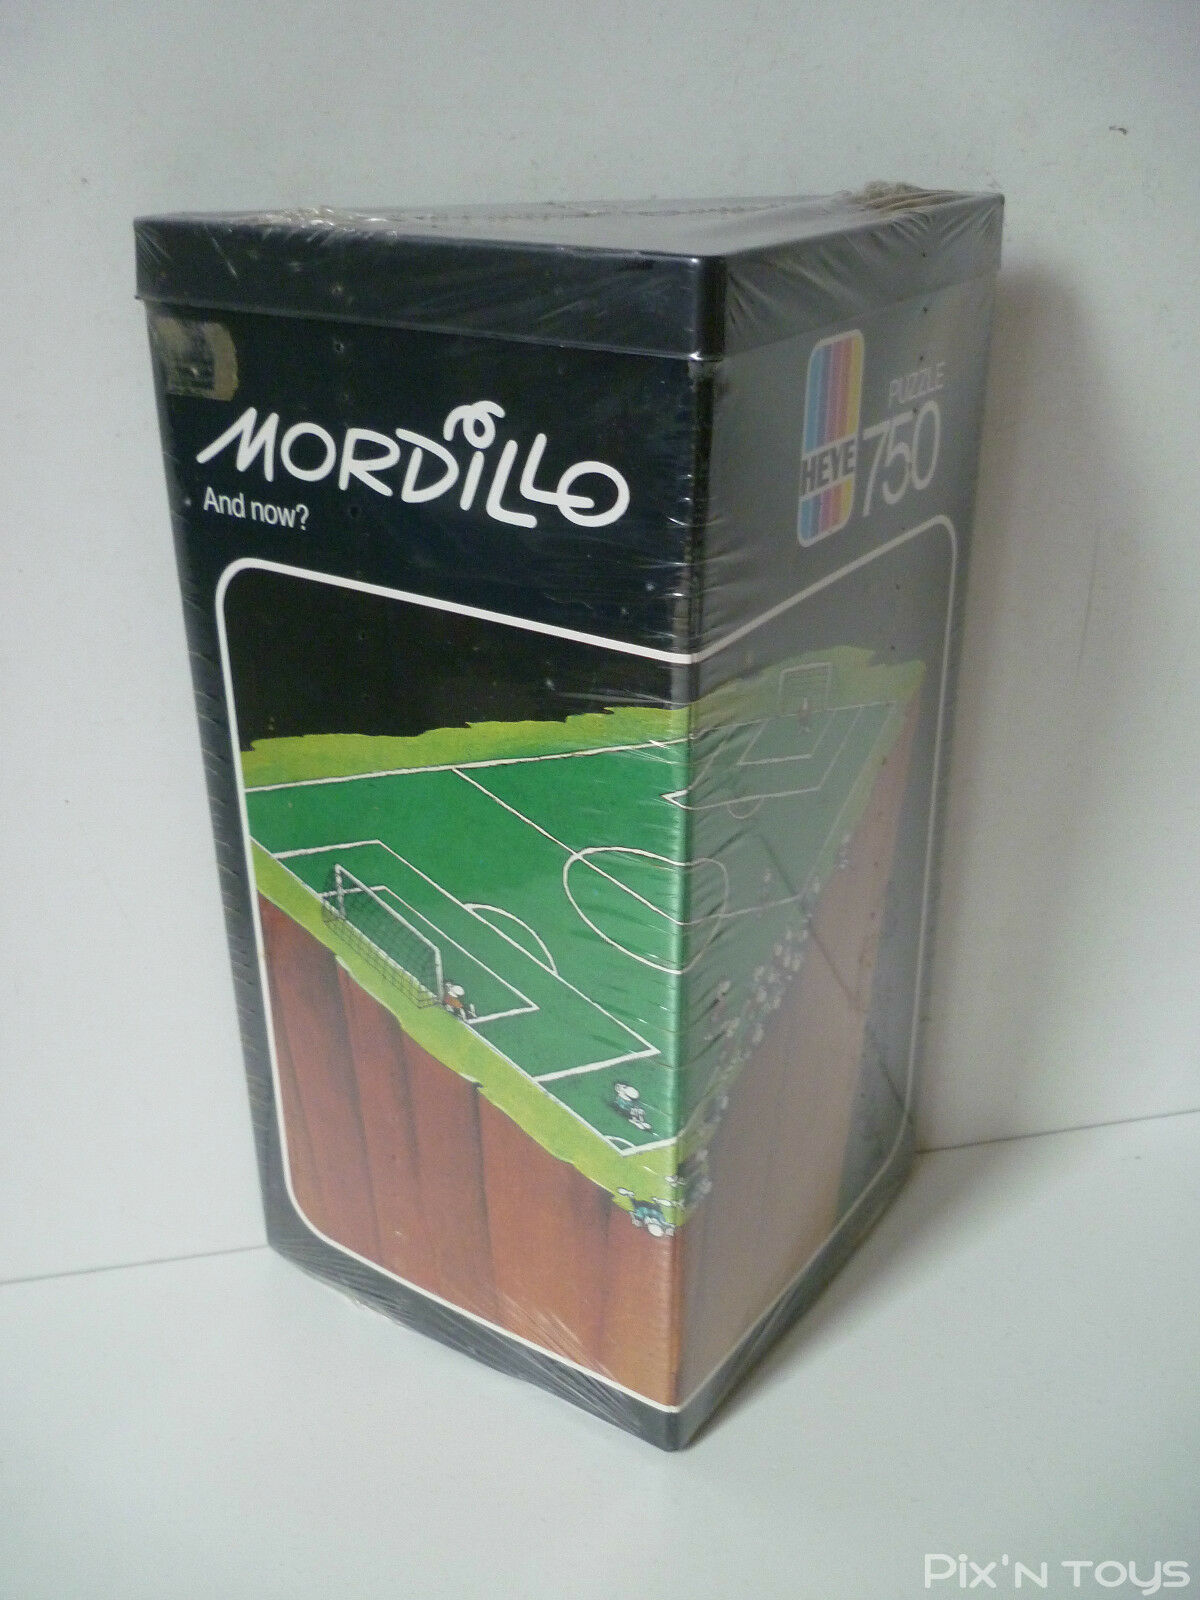 Puzzle 750 pièces Mordillo  And Now    Heye 1981